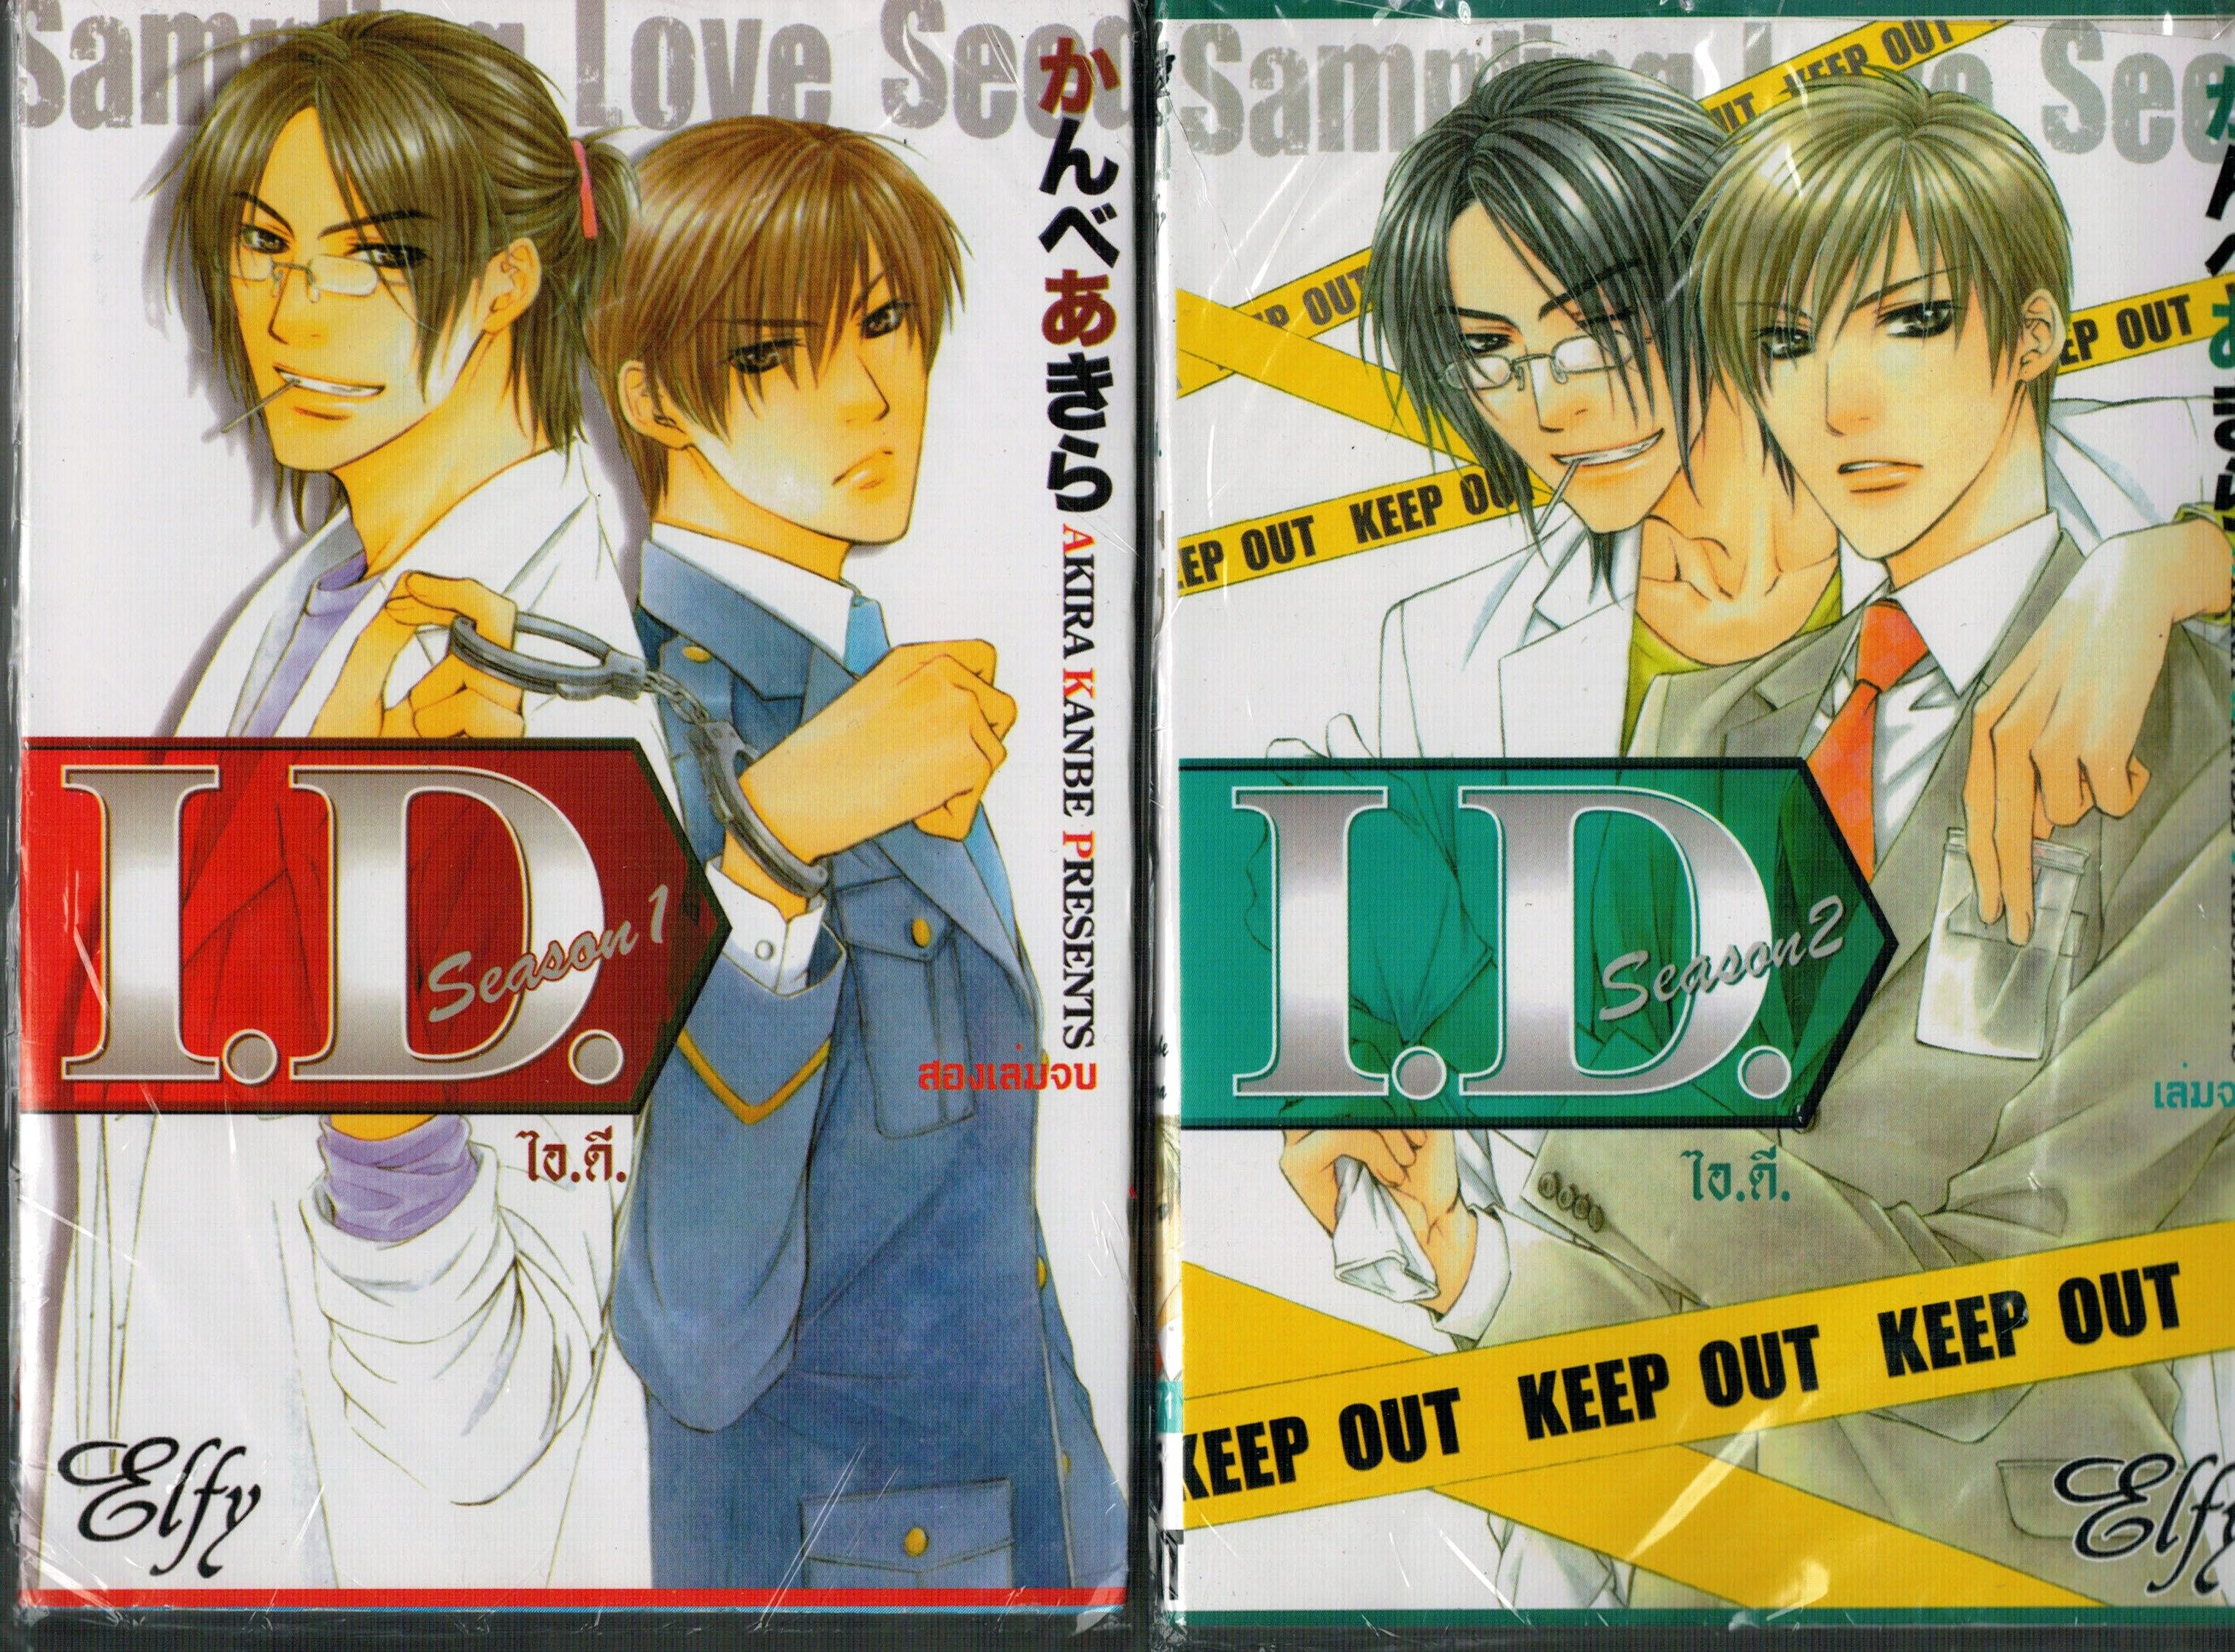 I.D. Season 1-3 (ล่าสุด) - Akira Kanbe